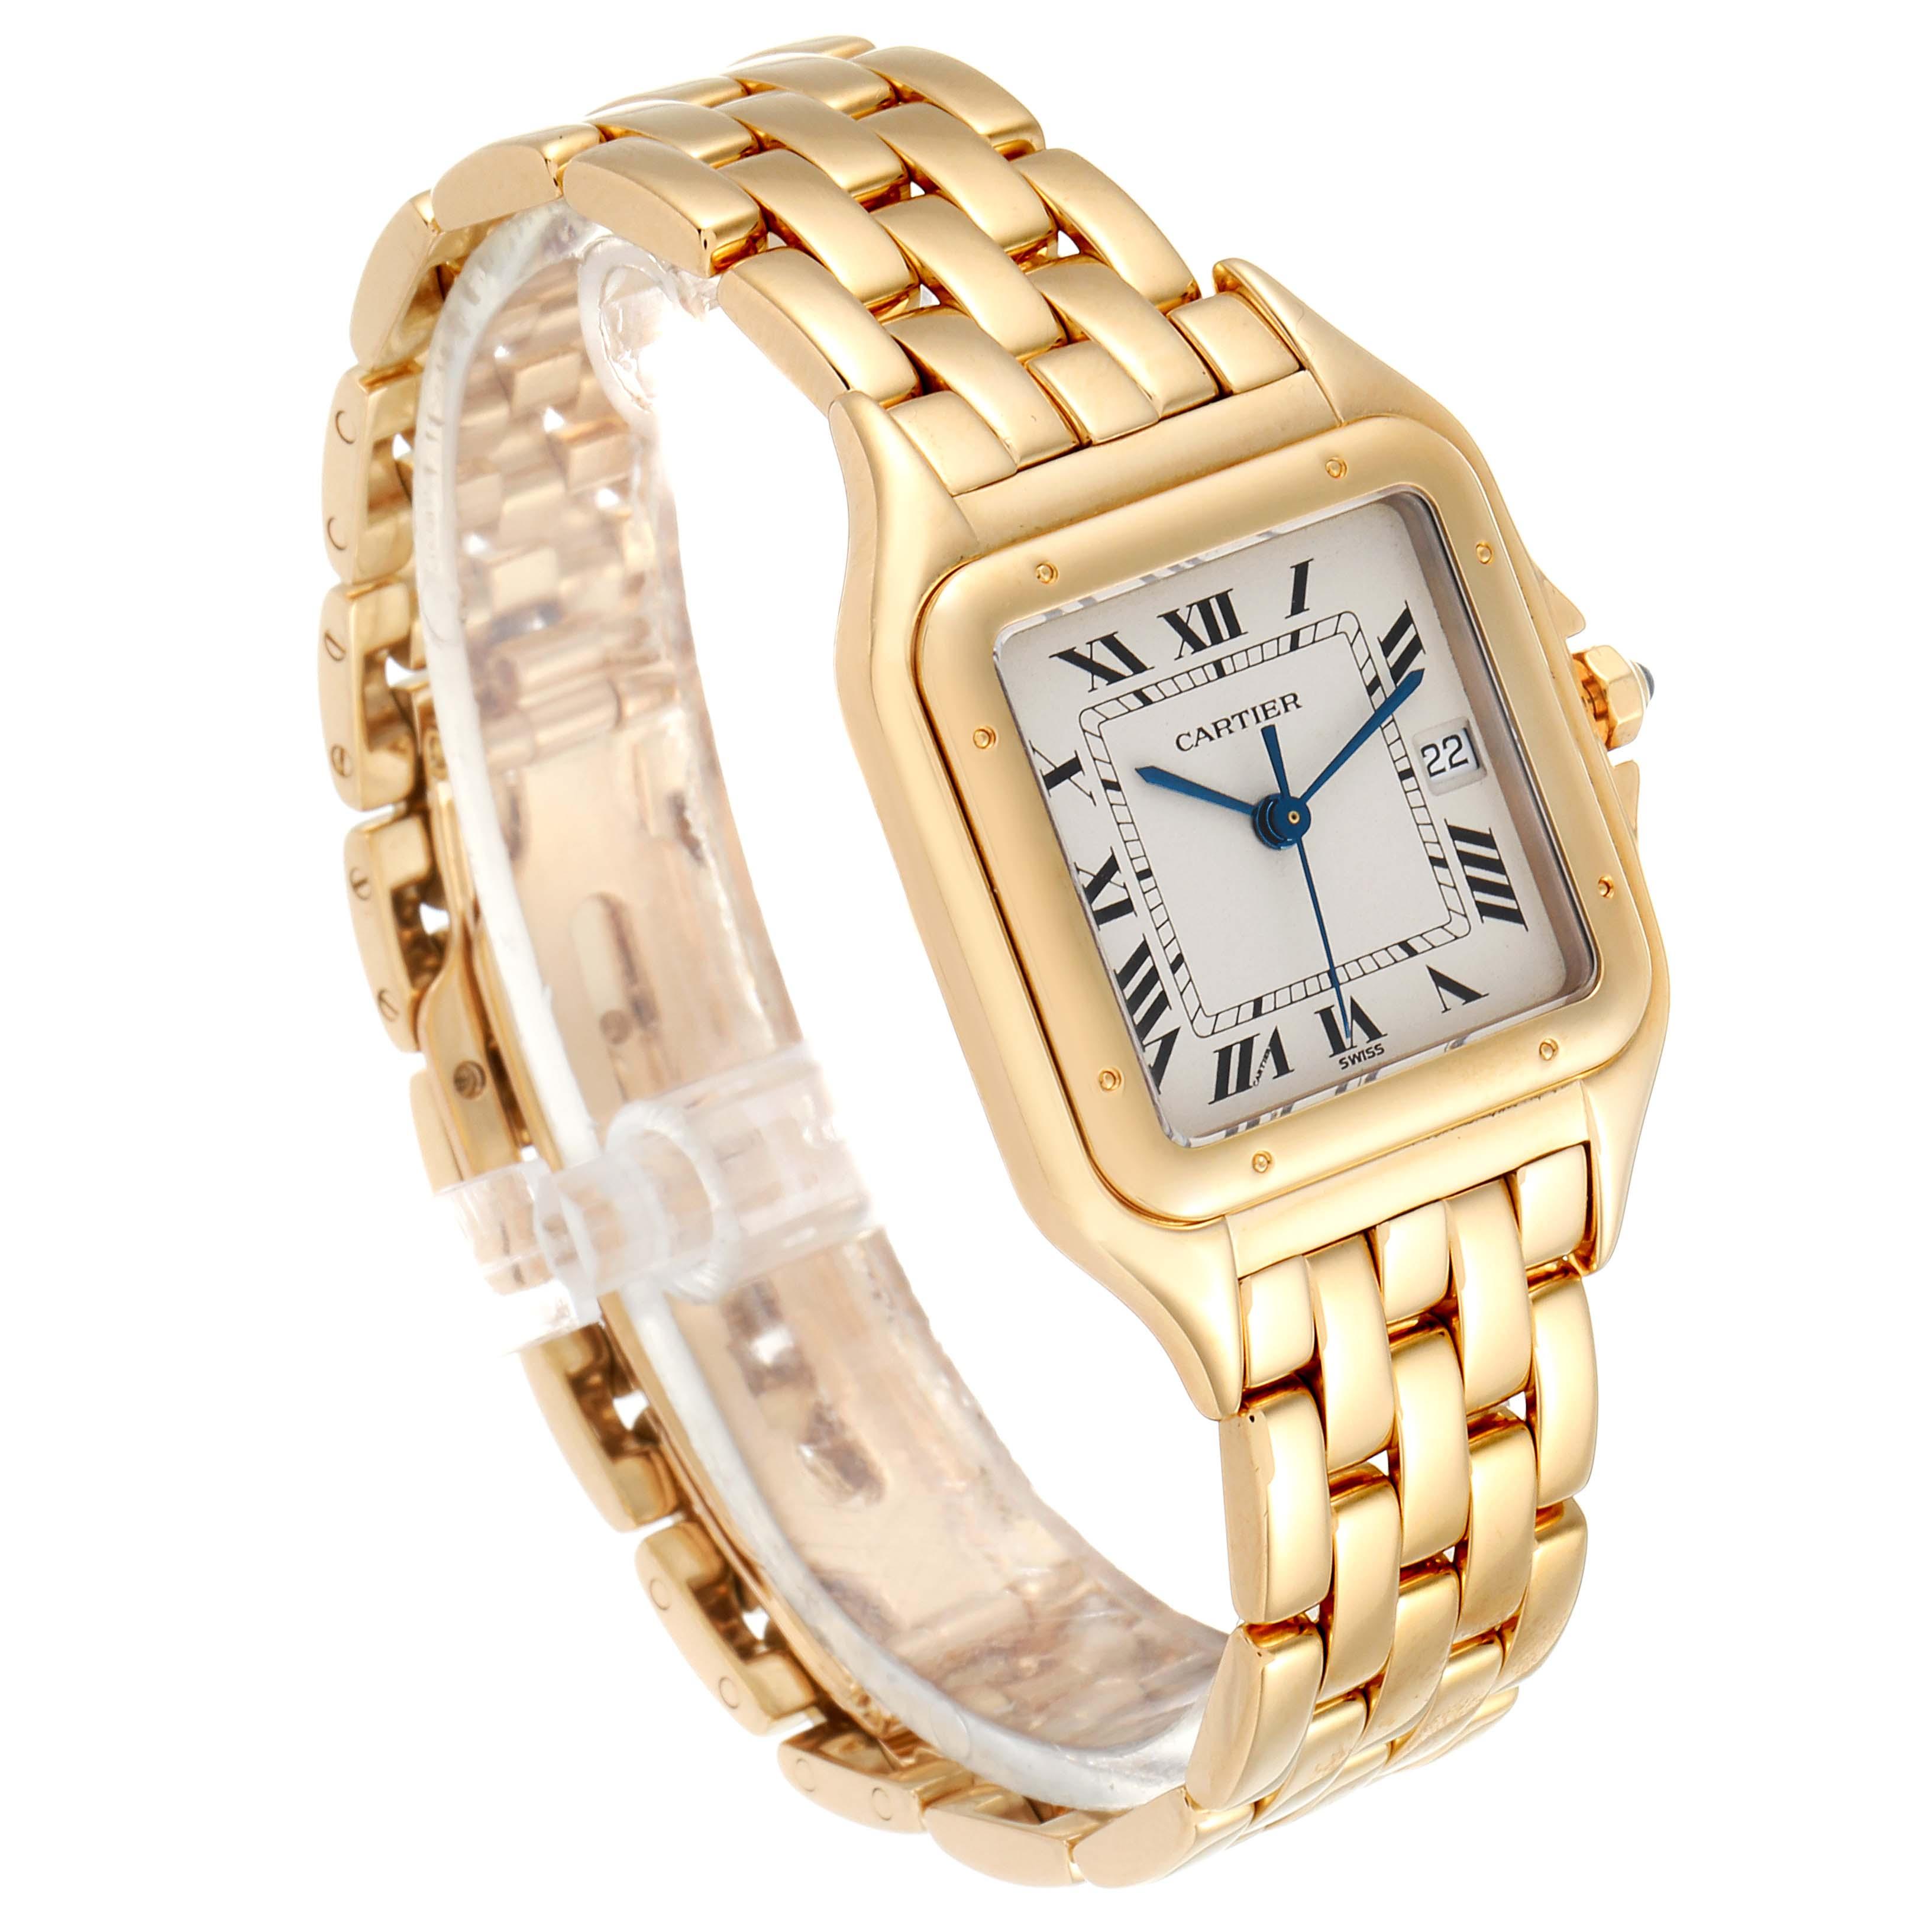 Cartier Panthere XL Blue Sapphire Yellow Gold Unisex Watch W25014B9 Box SwissWatchExpo